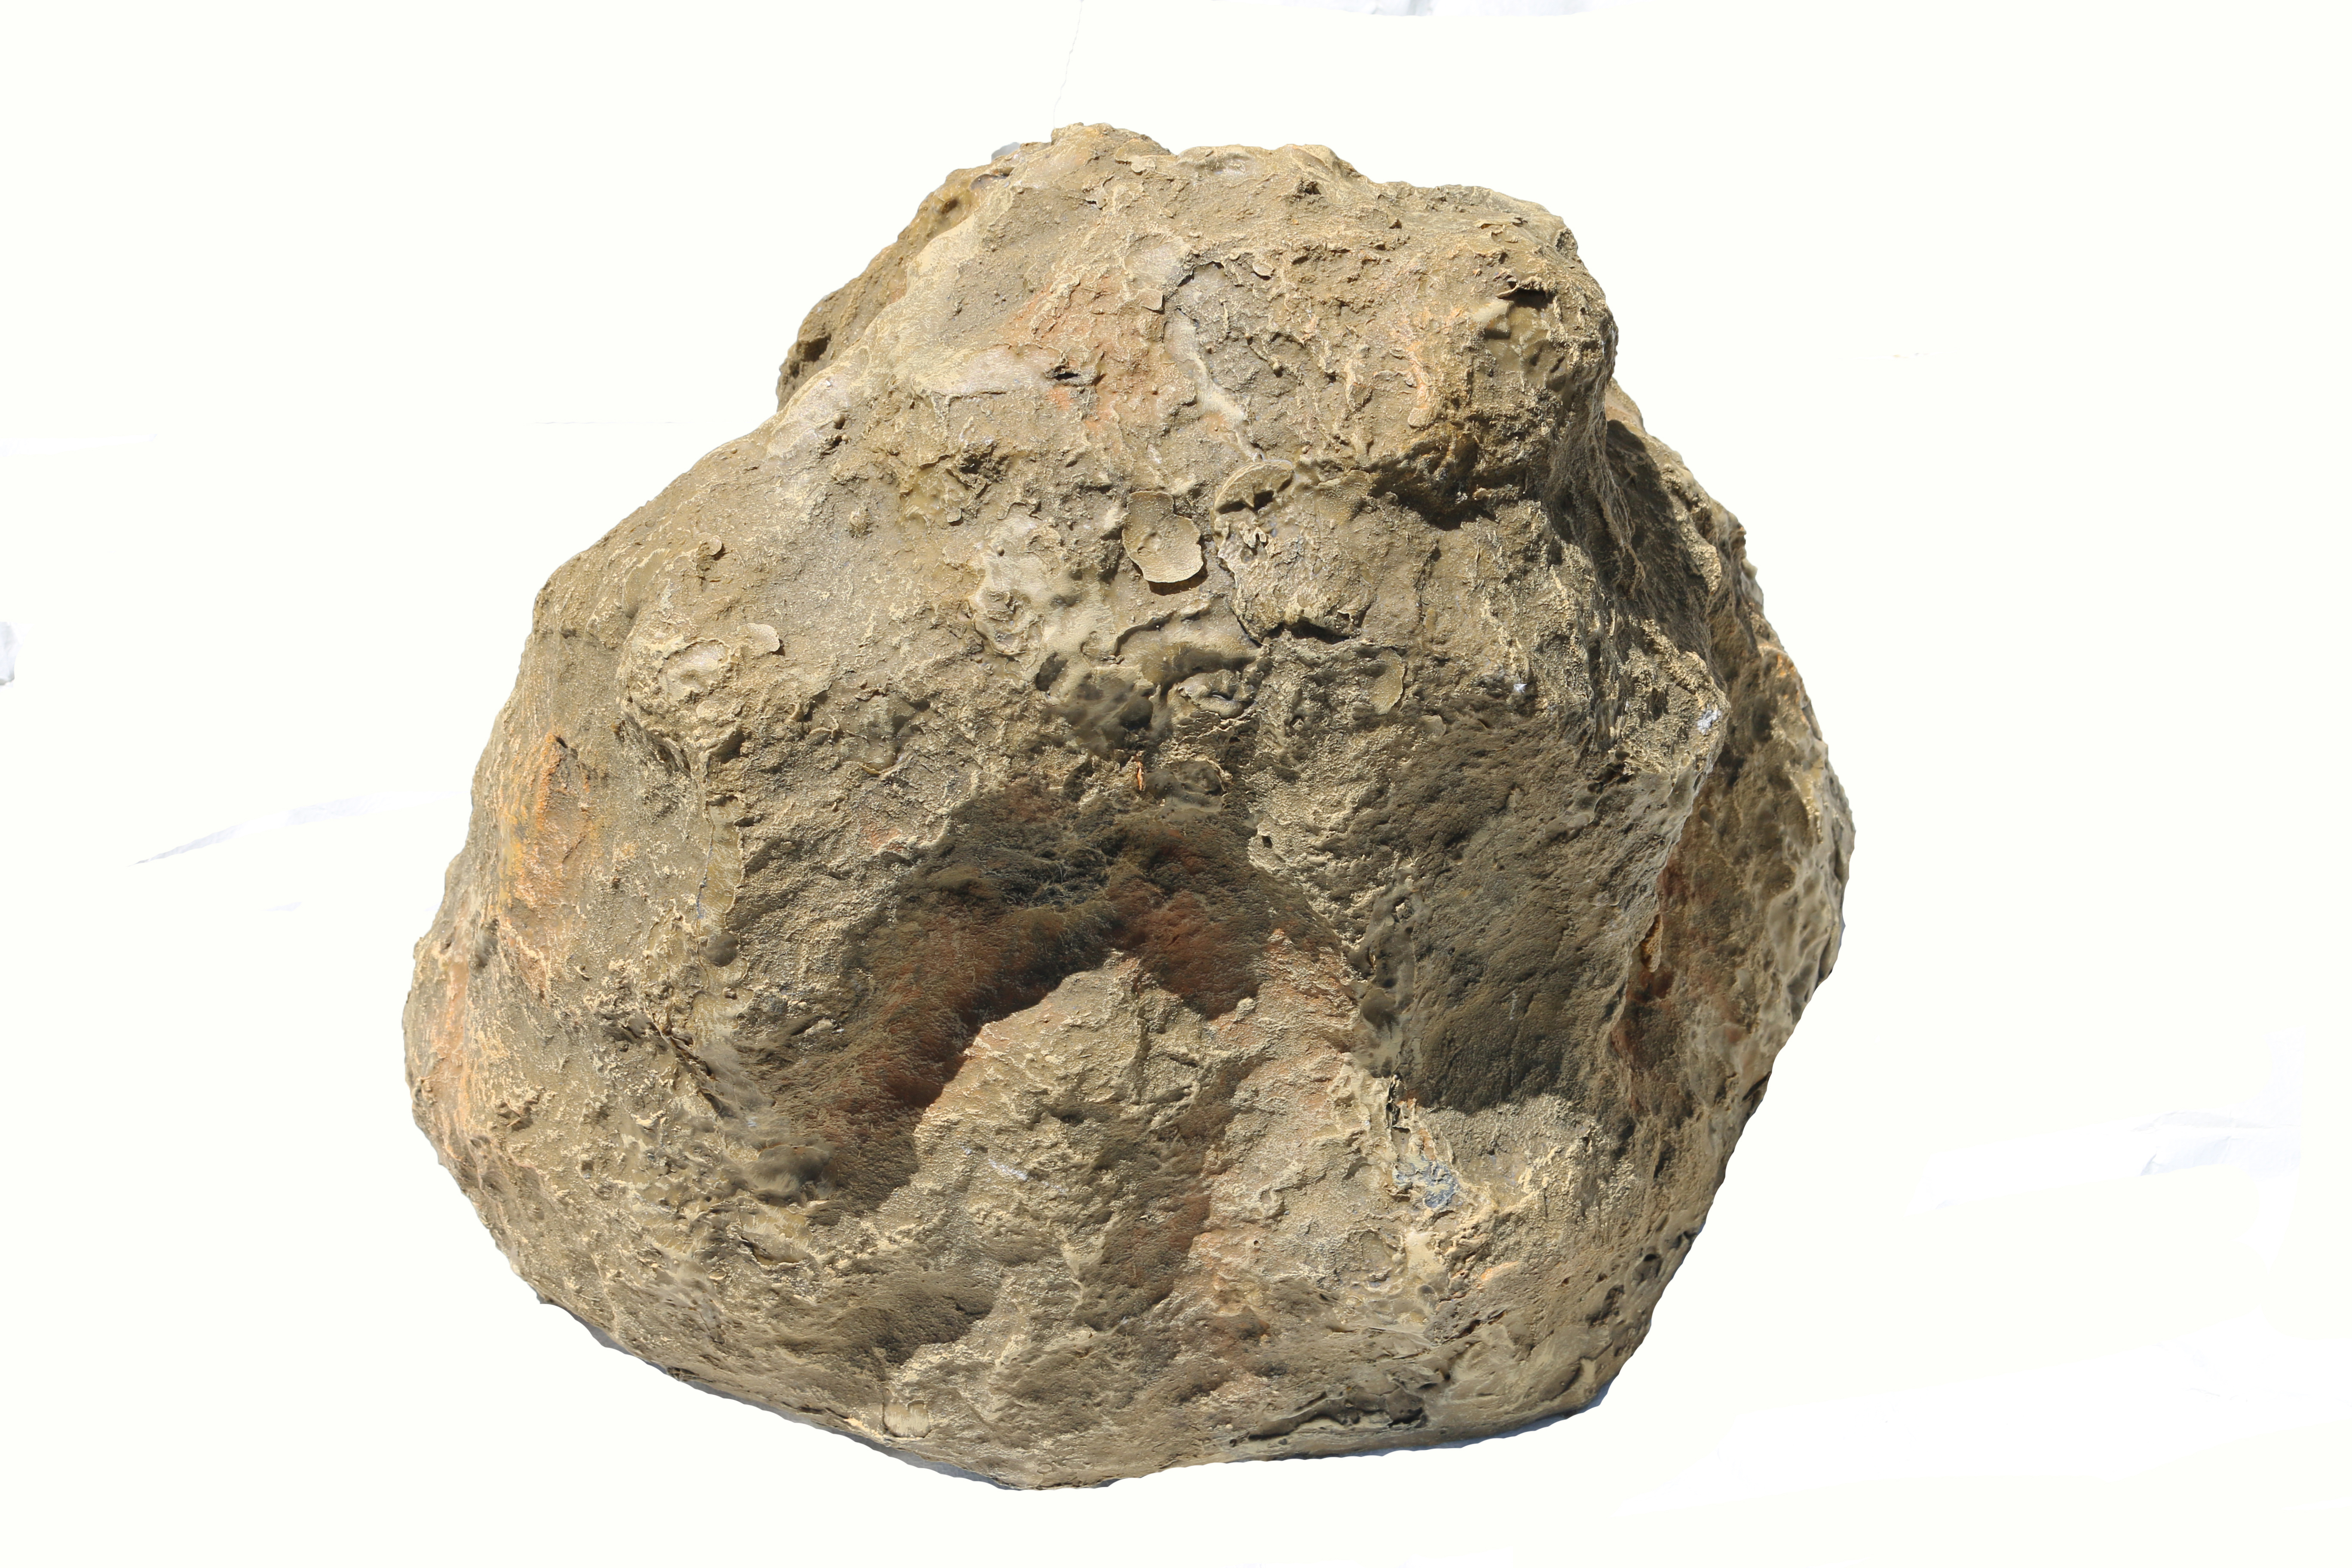 Rock photo